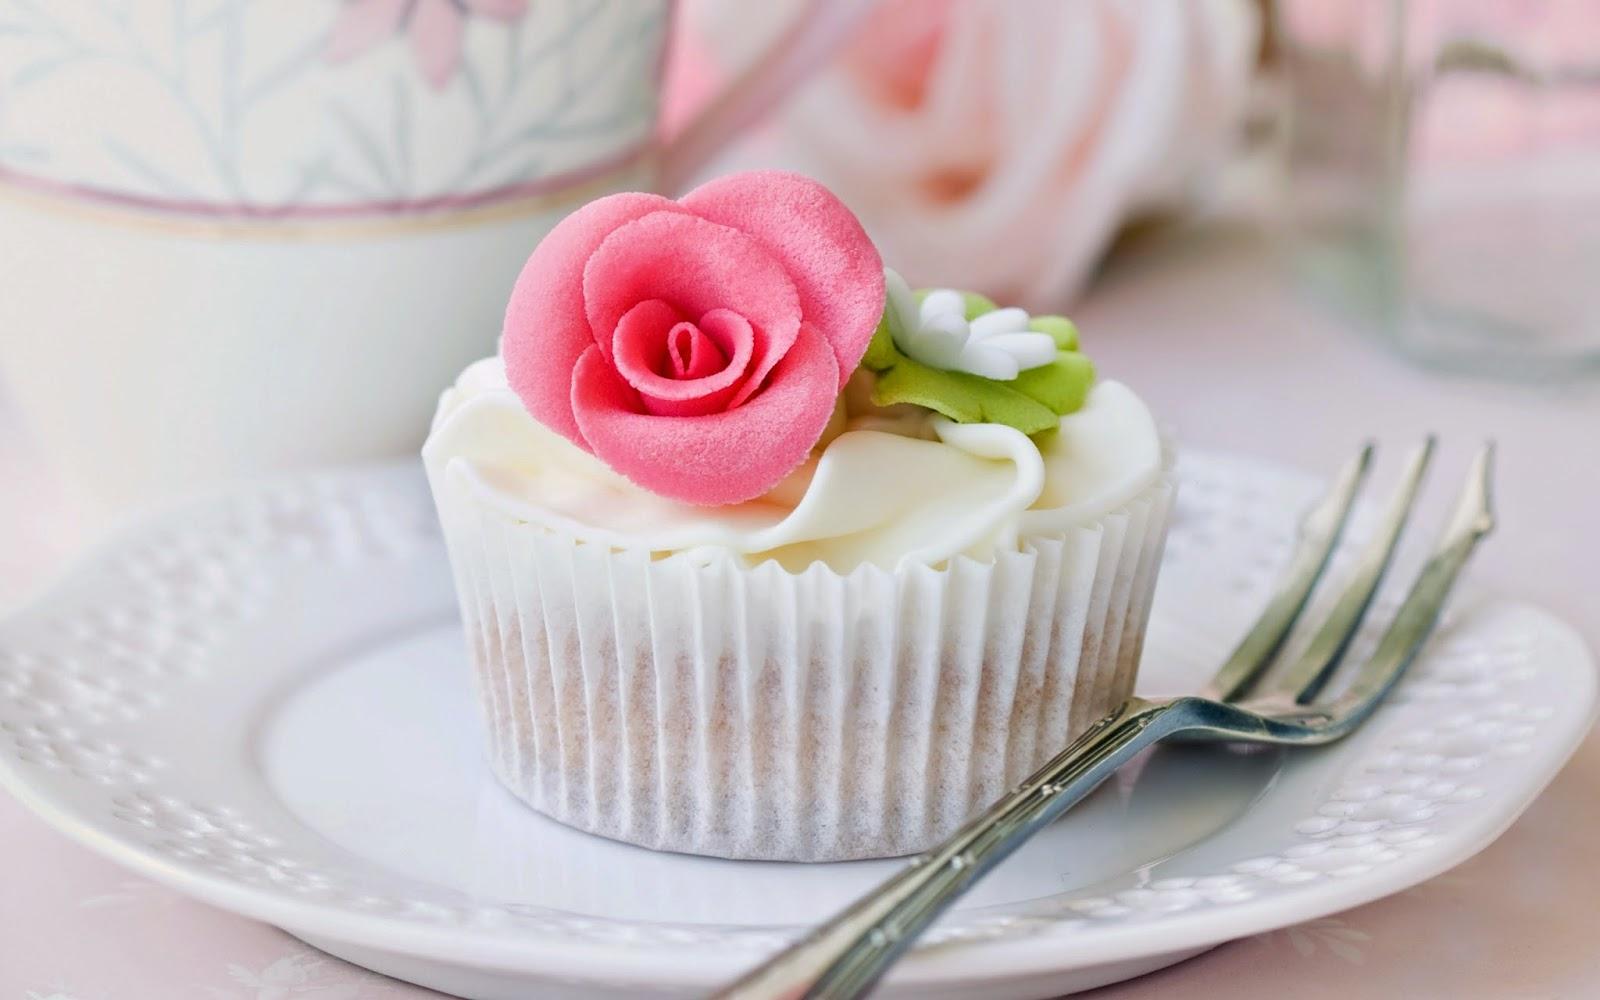 Gifs y fondos pazenlatormenta fondos de pantalla de cupcakes